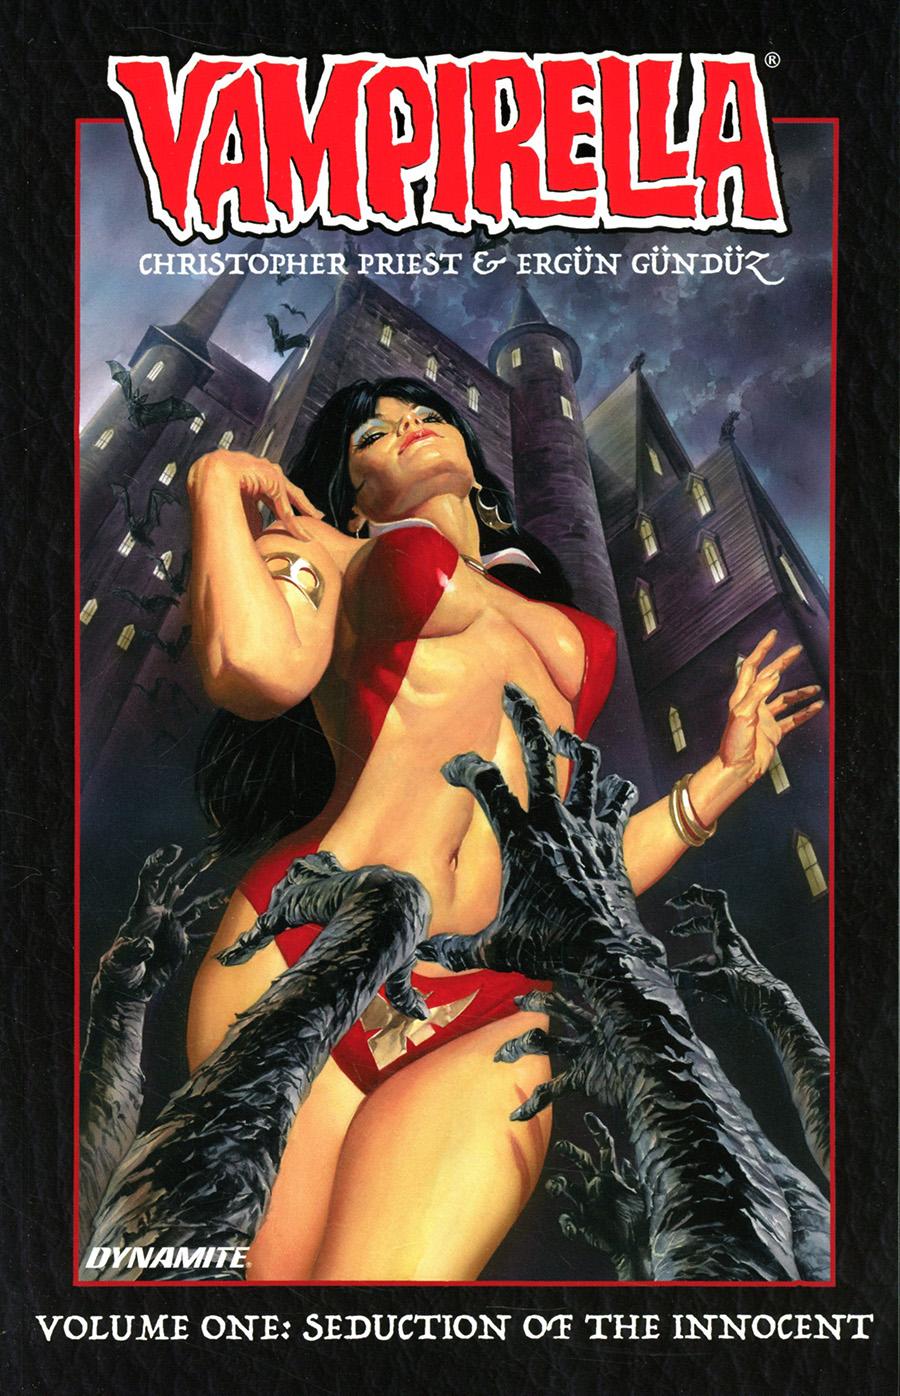 Vampirella Seduction Of The Innocent Vol 1 TP